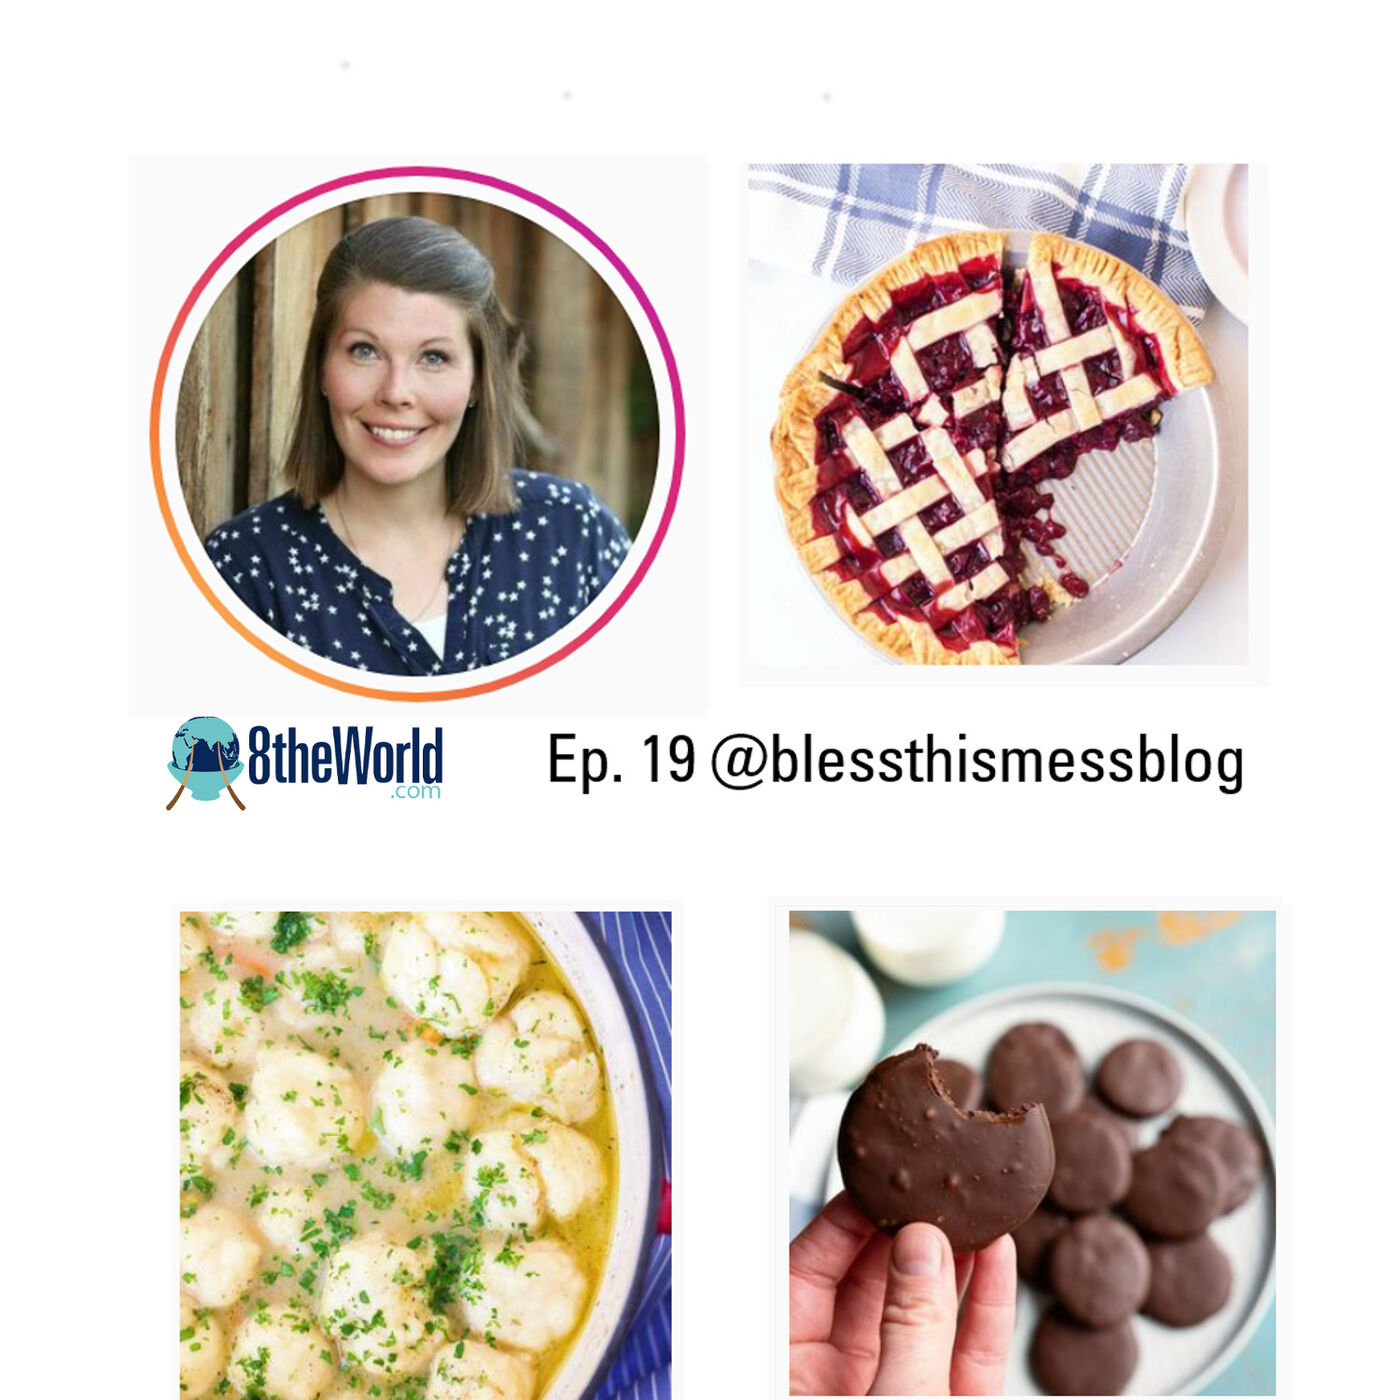 Ep 19 Melissa Griffiths - Blessthismessblog